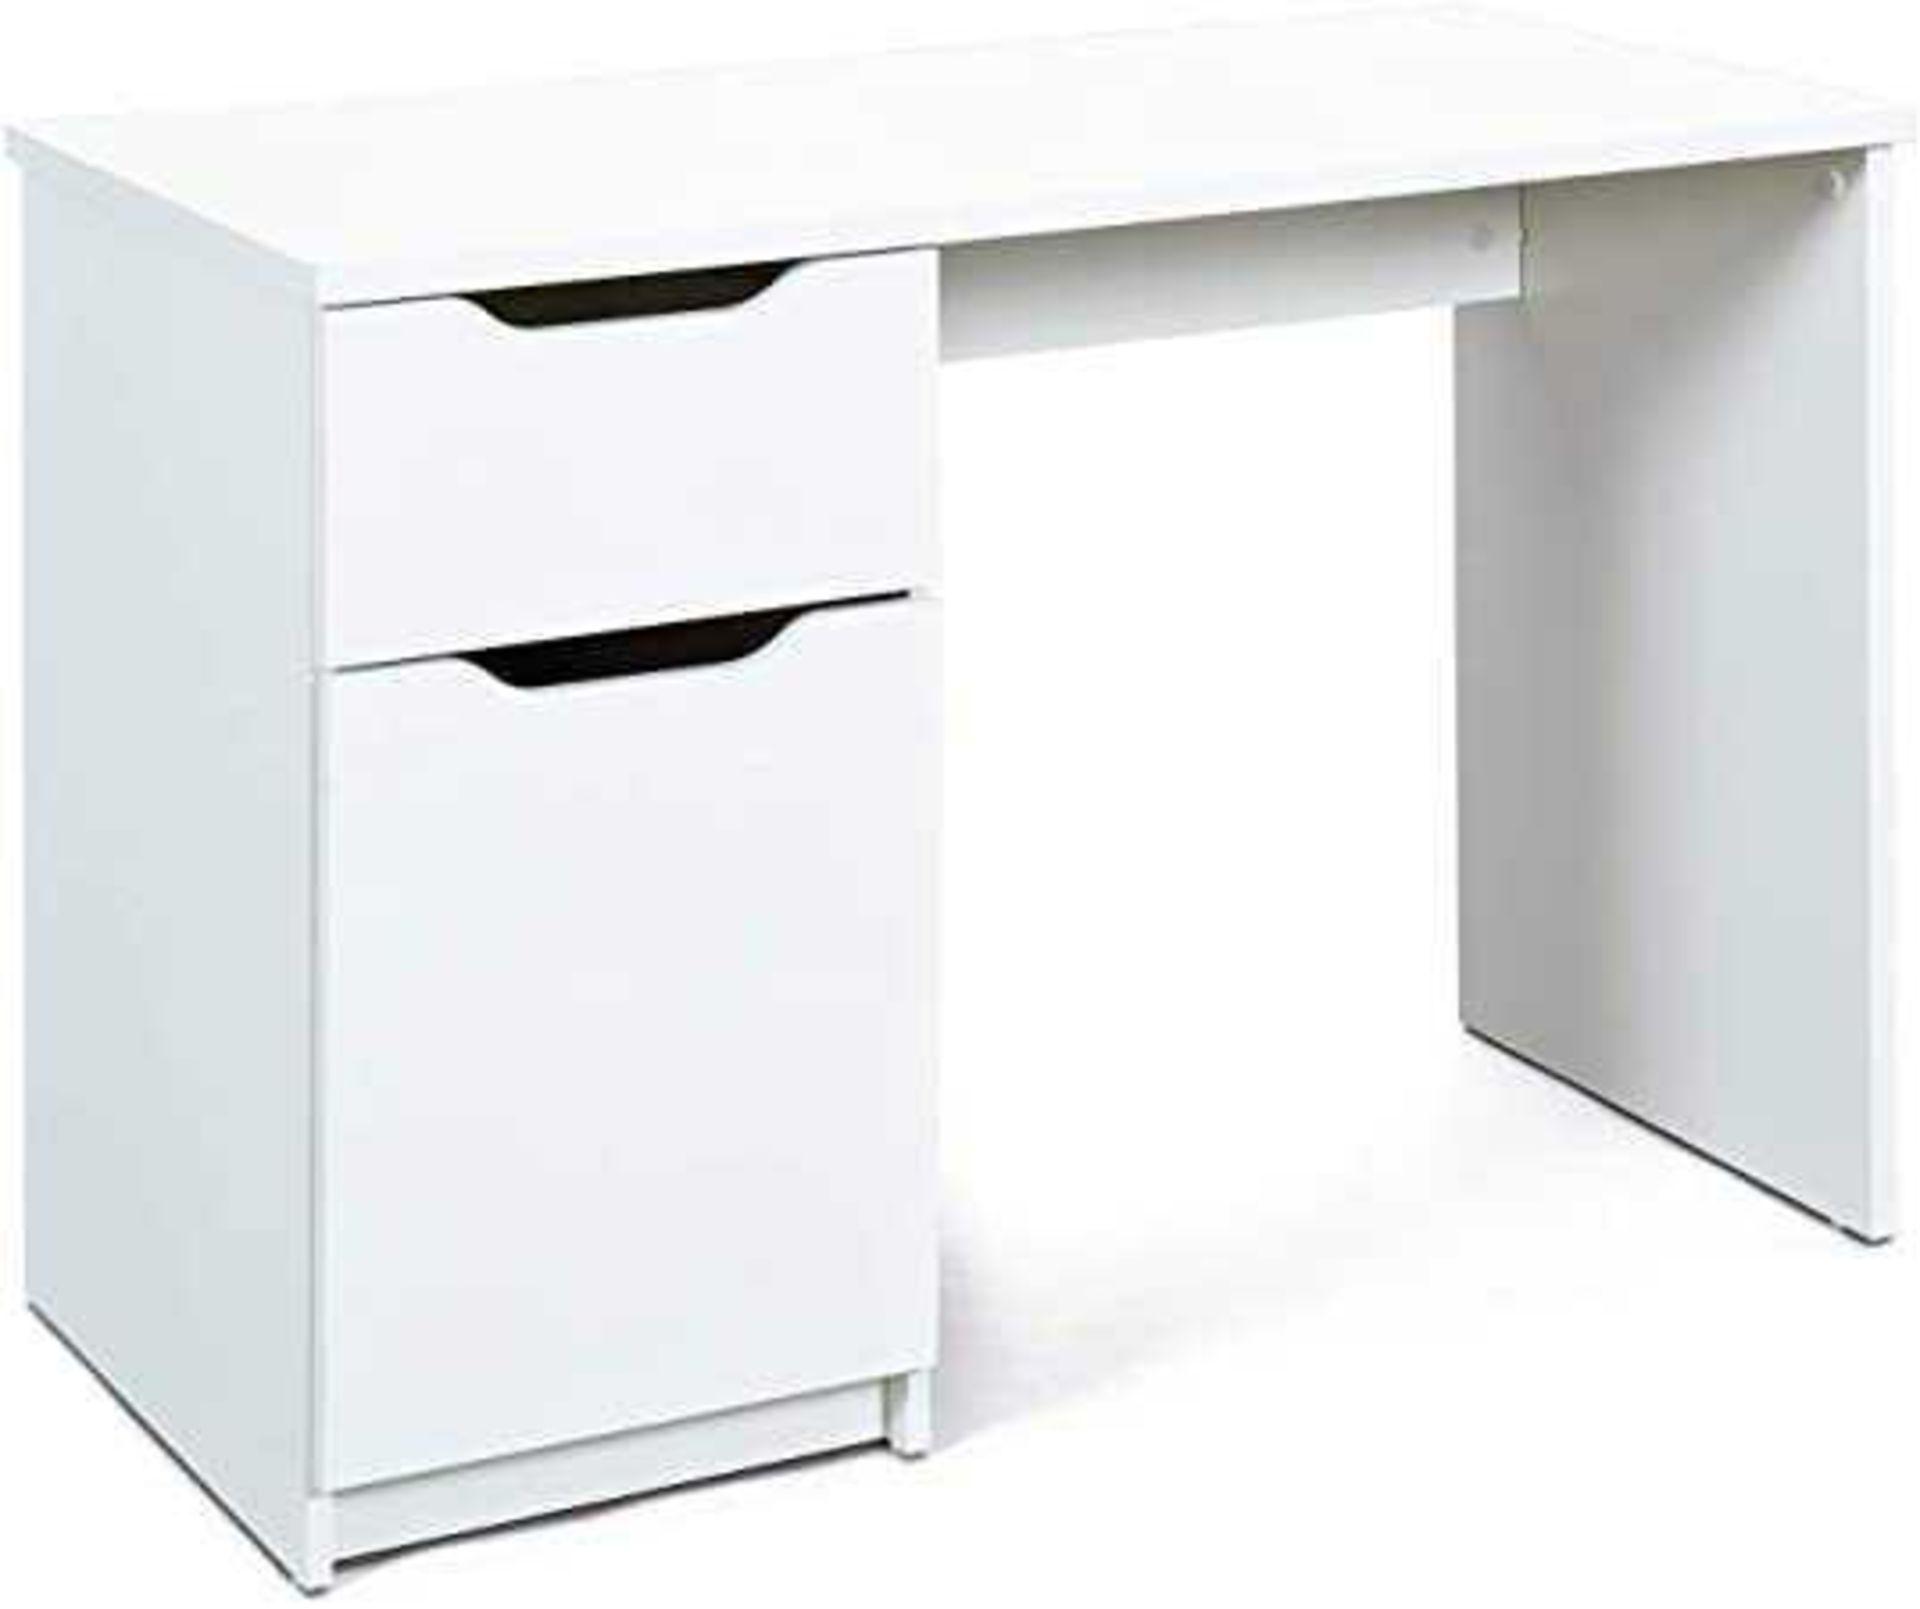 RRP £190 - Boxed 'Westphalen' 1 Door, 1 Drawer Office Desk In White Melamine Coated Wood